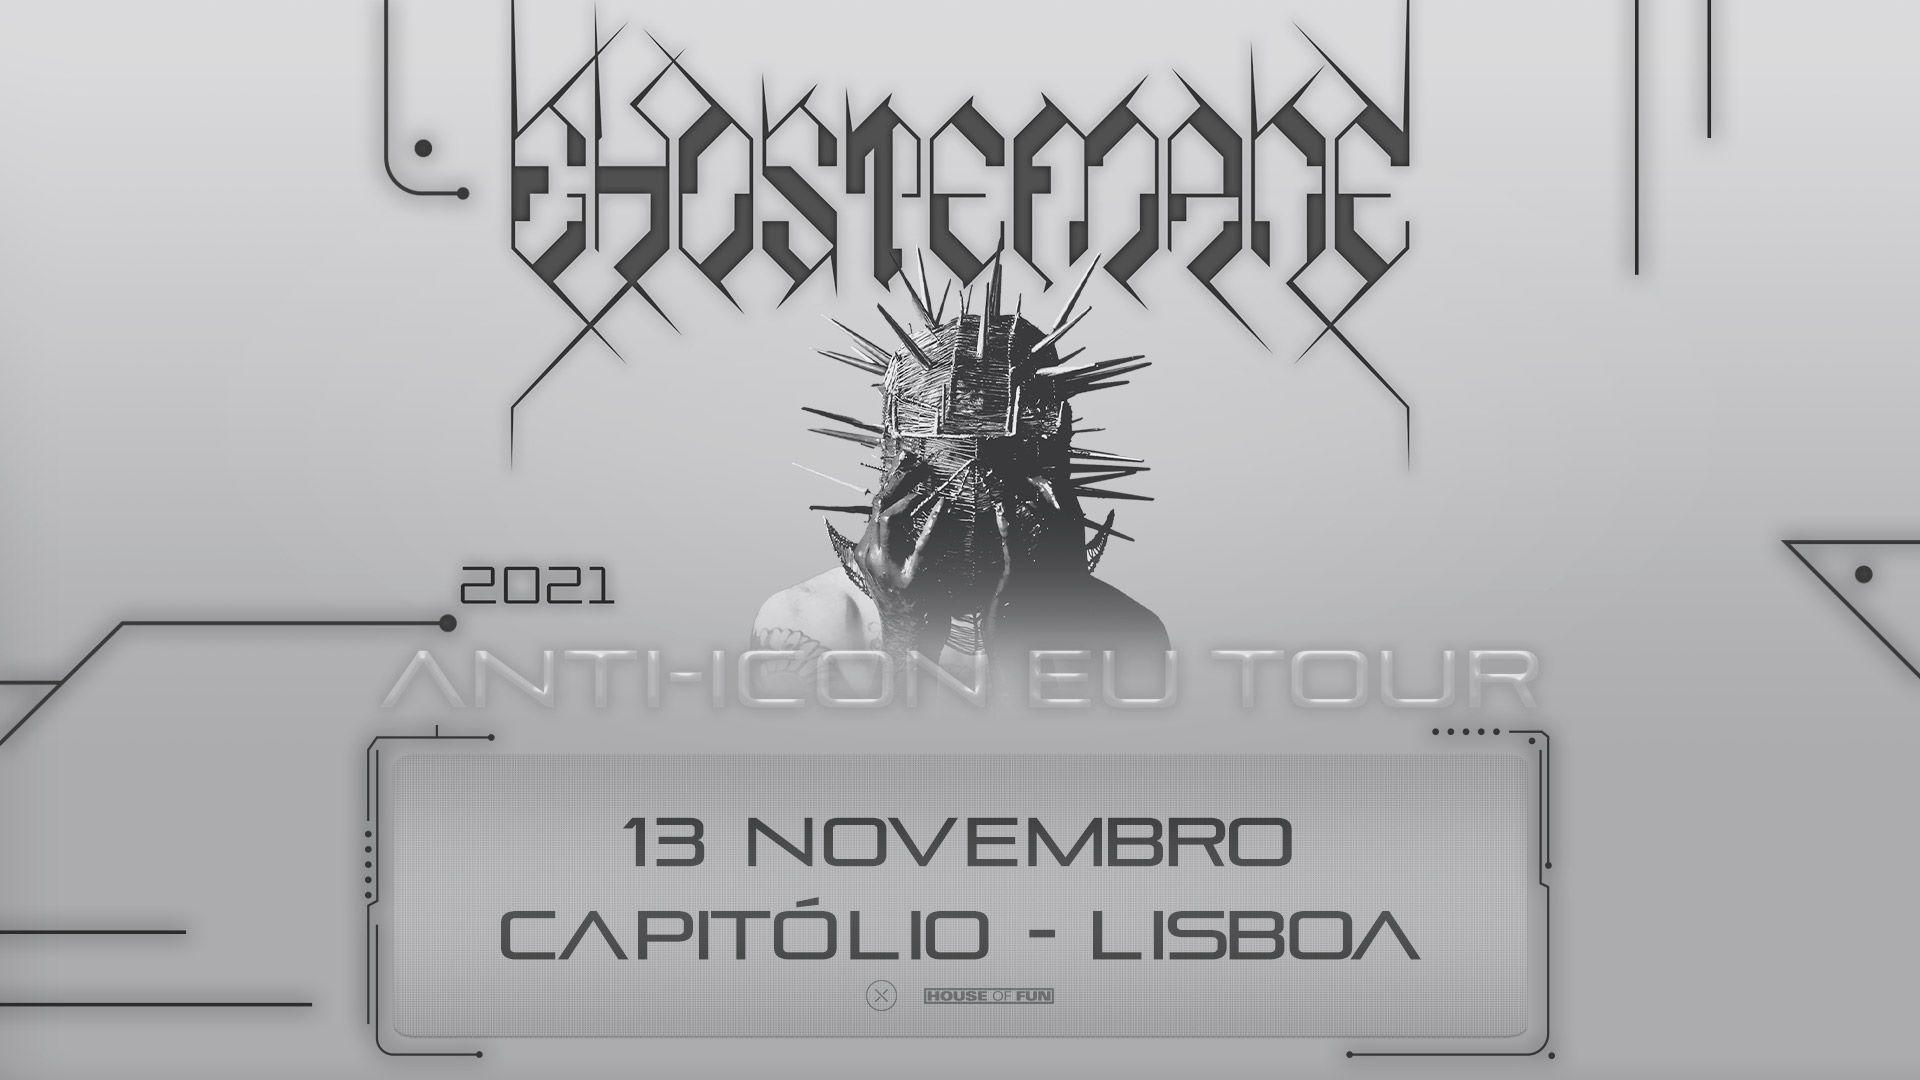 Ghostemane - Capitólio, Lisboa